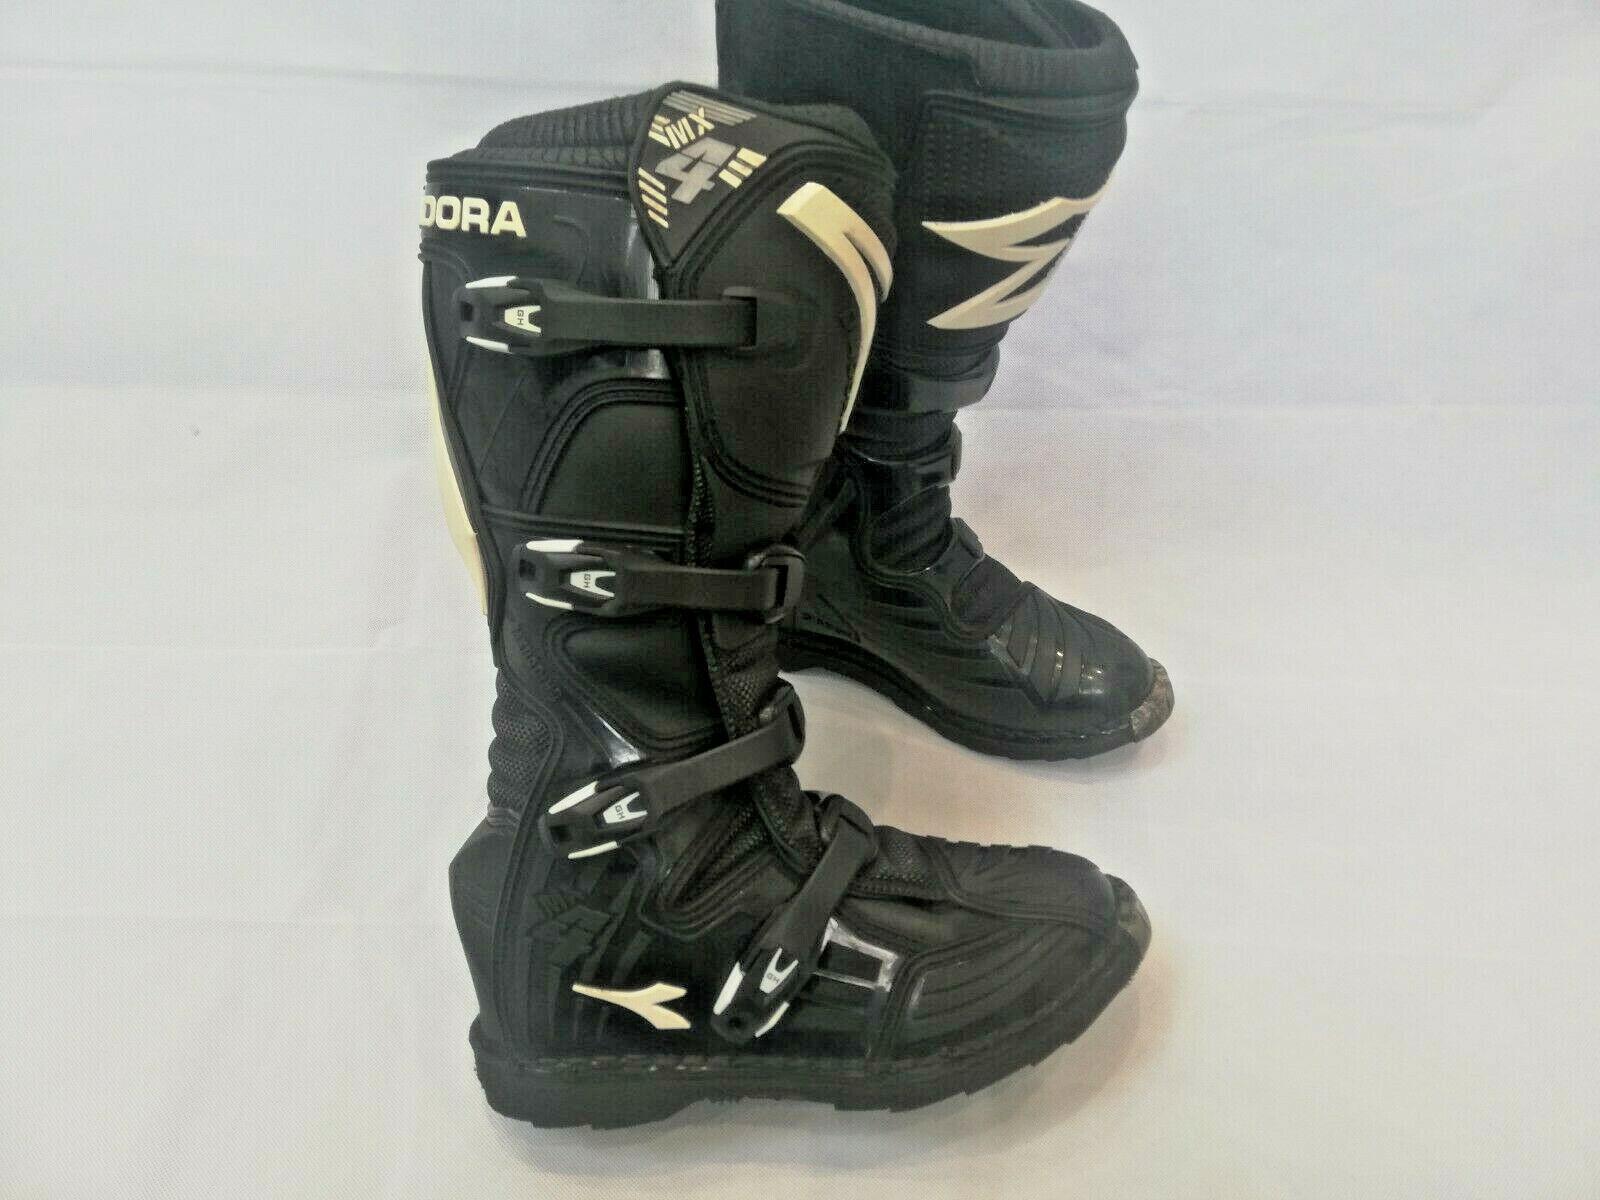 Genuine DIADORA MX4 MOTOCROSS BOOTS IN BLACK UK8 EU42